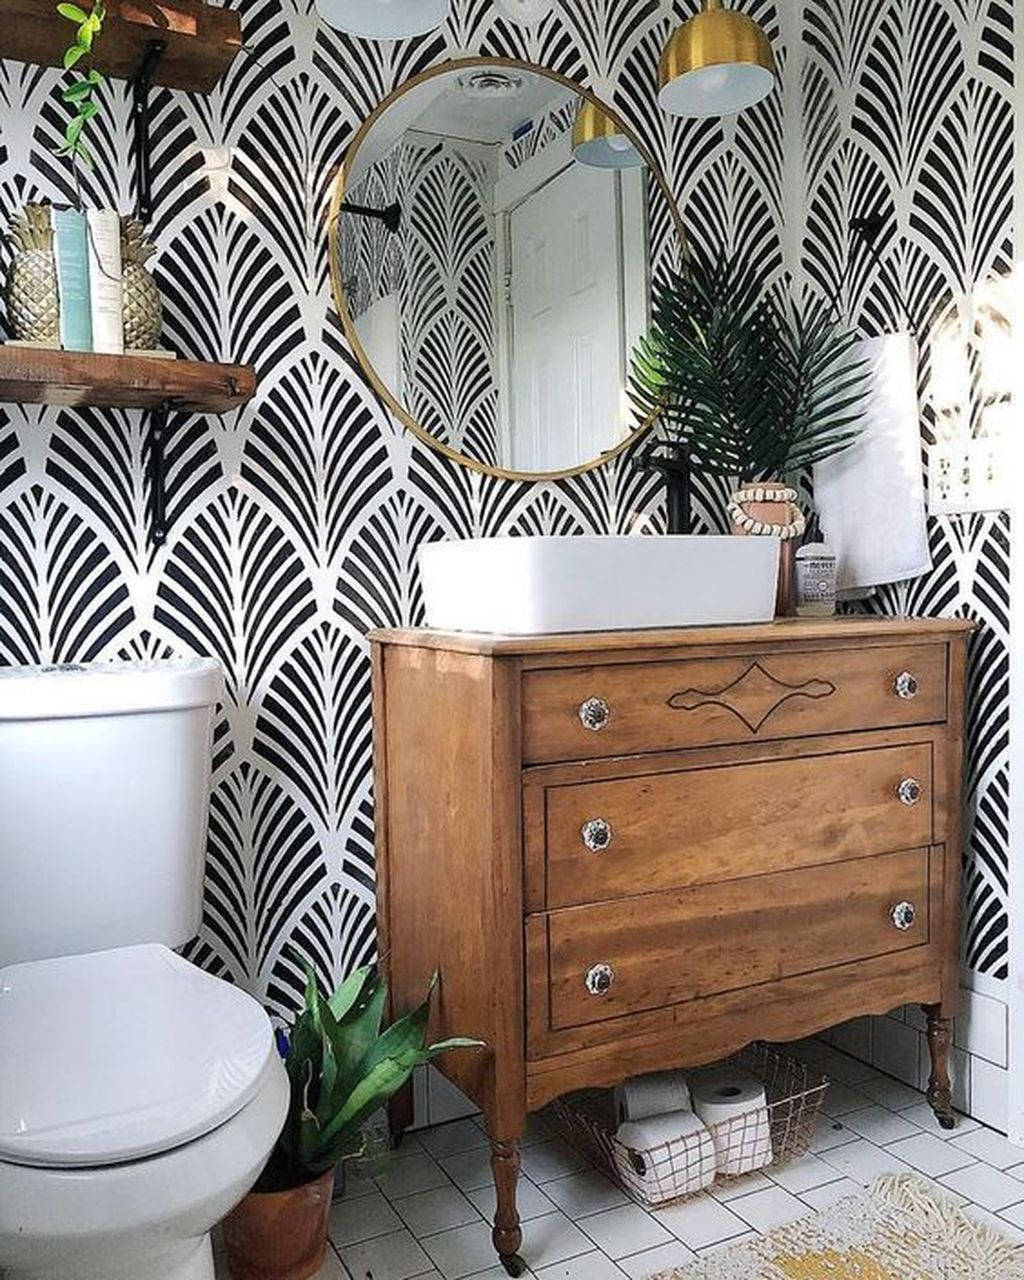 Unusual Bathroom Design Ideas You Need To Know 36